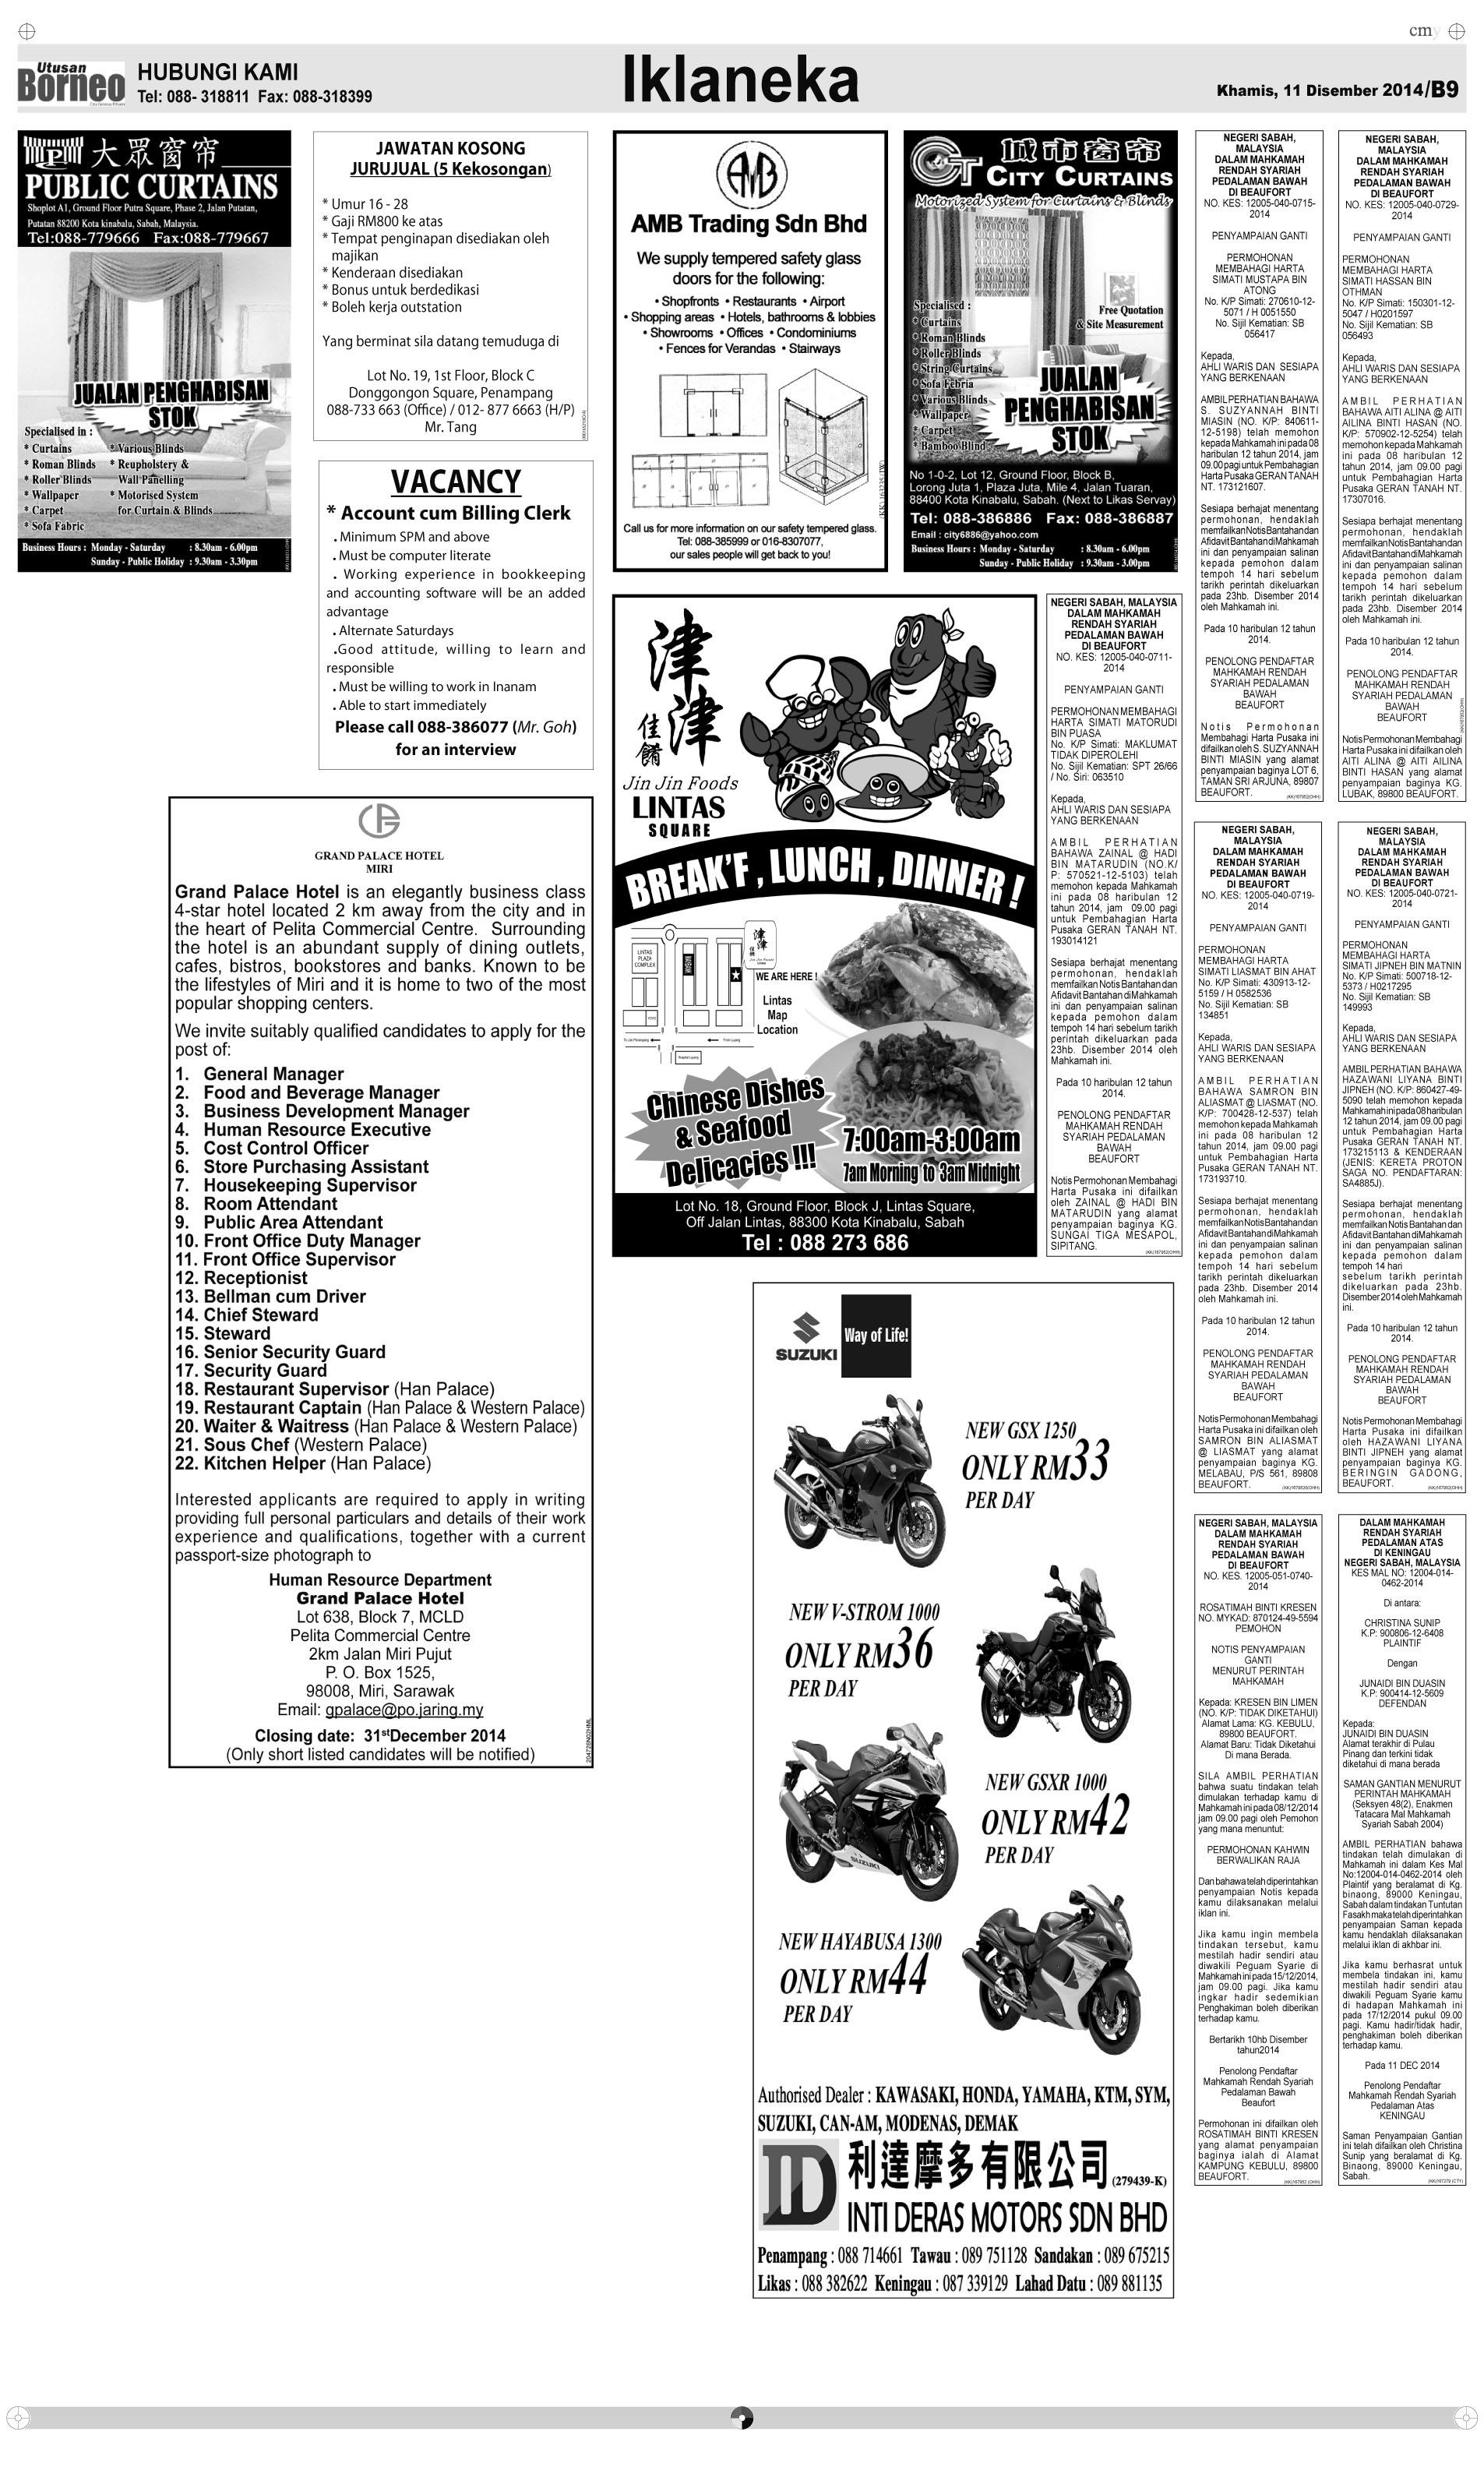 Utusan Borneo The Post Classifieds 11 12 Tahun Thursday Dec